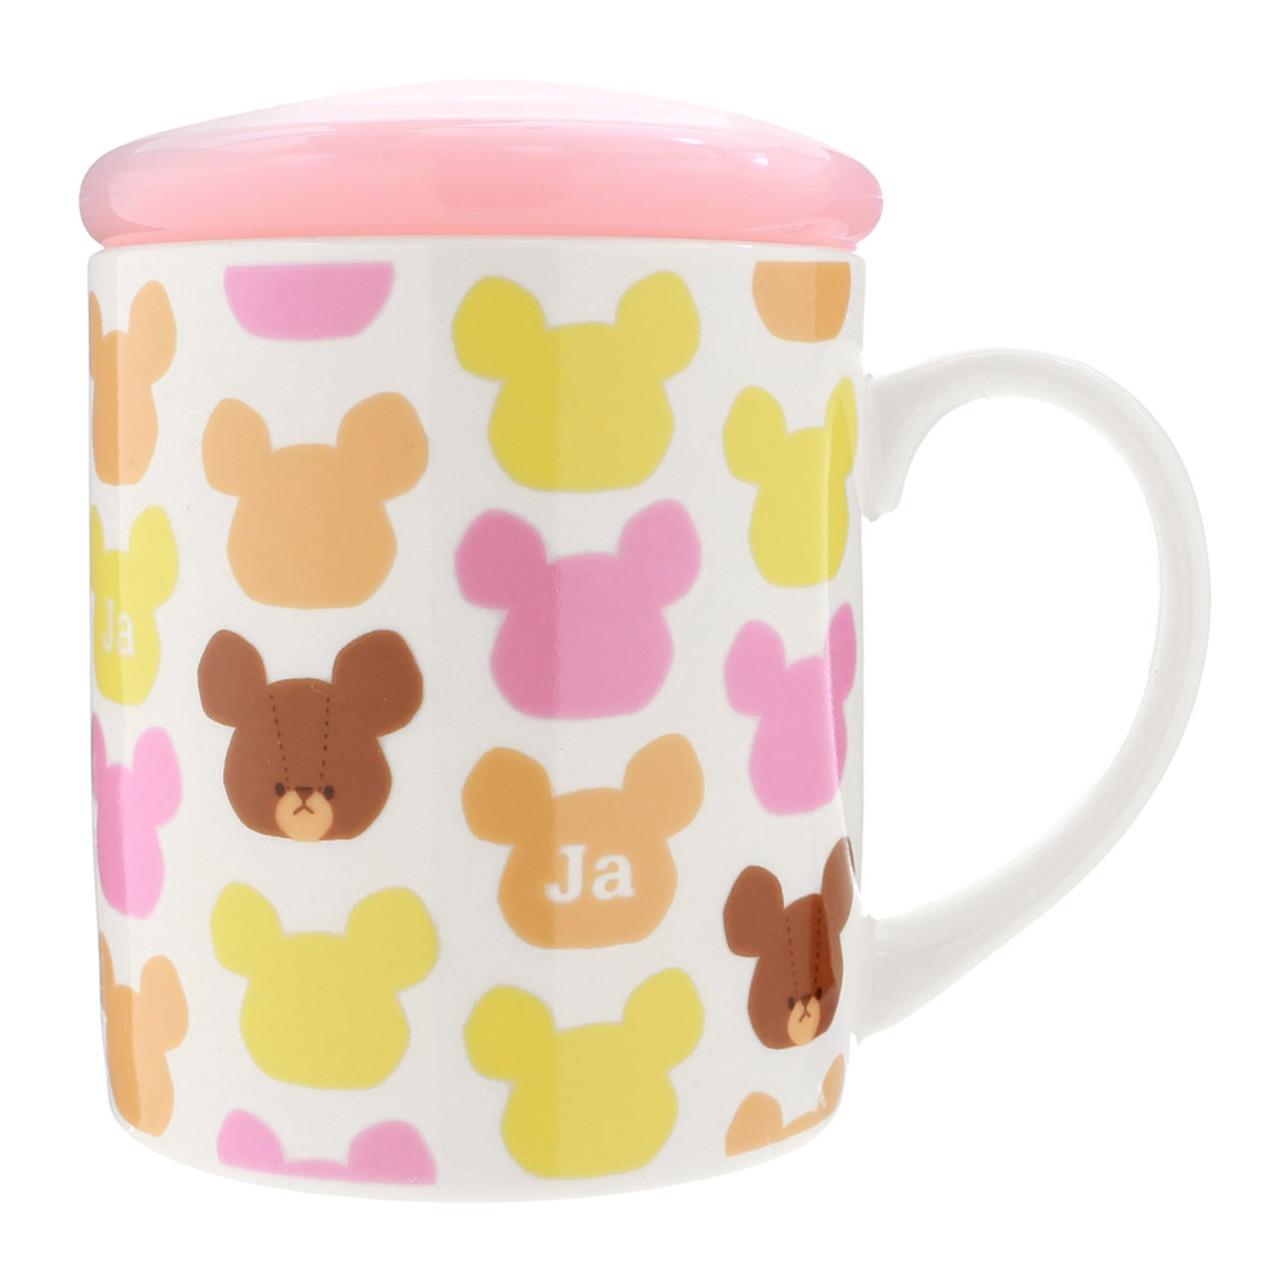 Bear School Jackie Pattern Ceramic Mug With Lid ( Mug + Lid View )